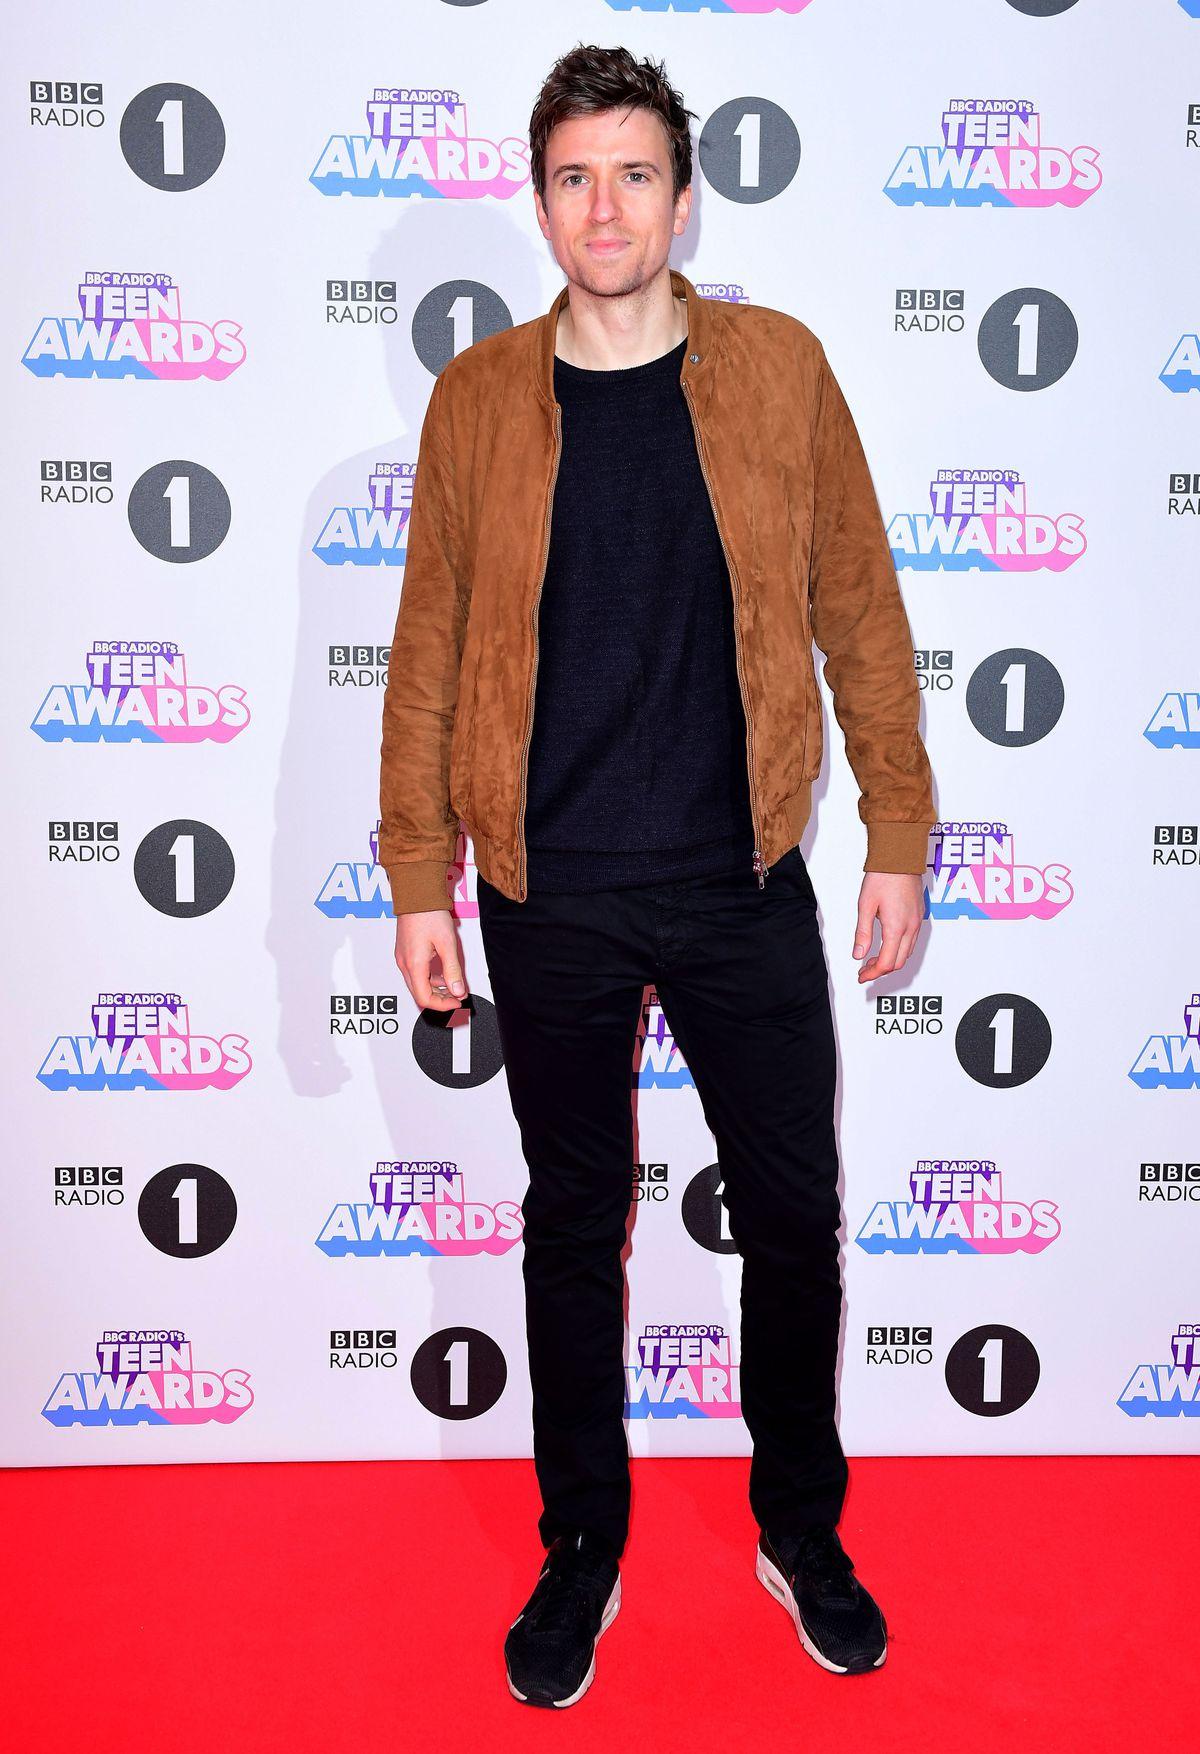 Greg James - host of the Radio One Breakfast Show